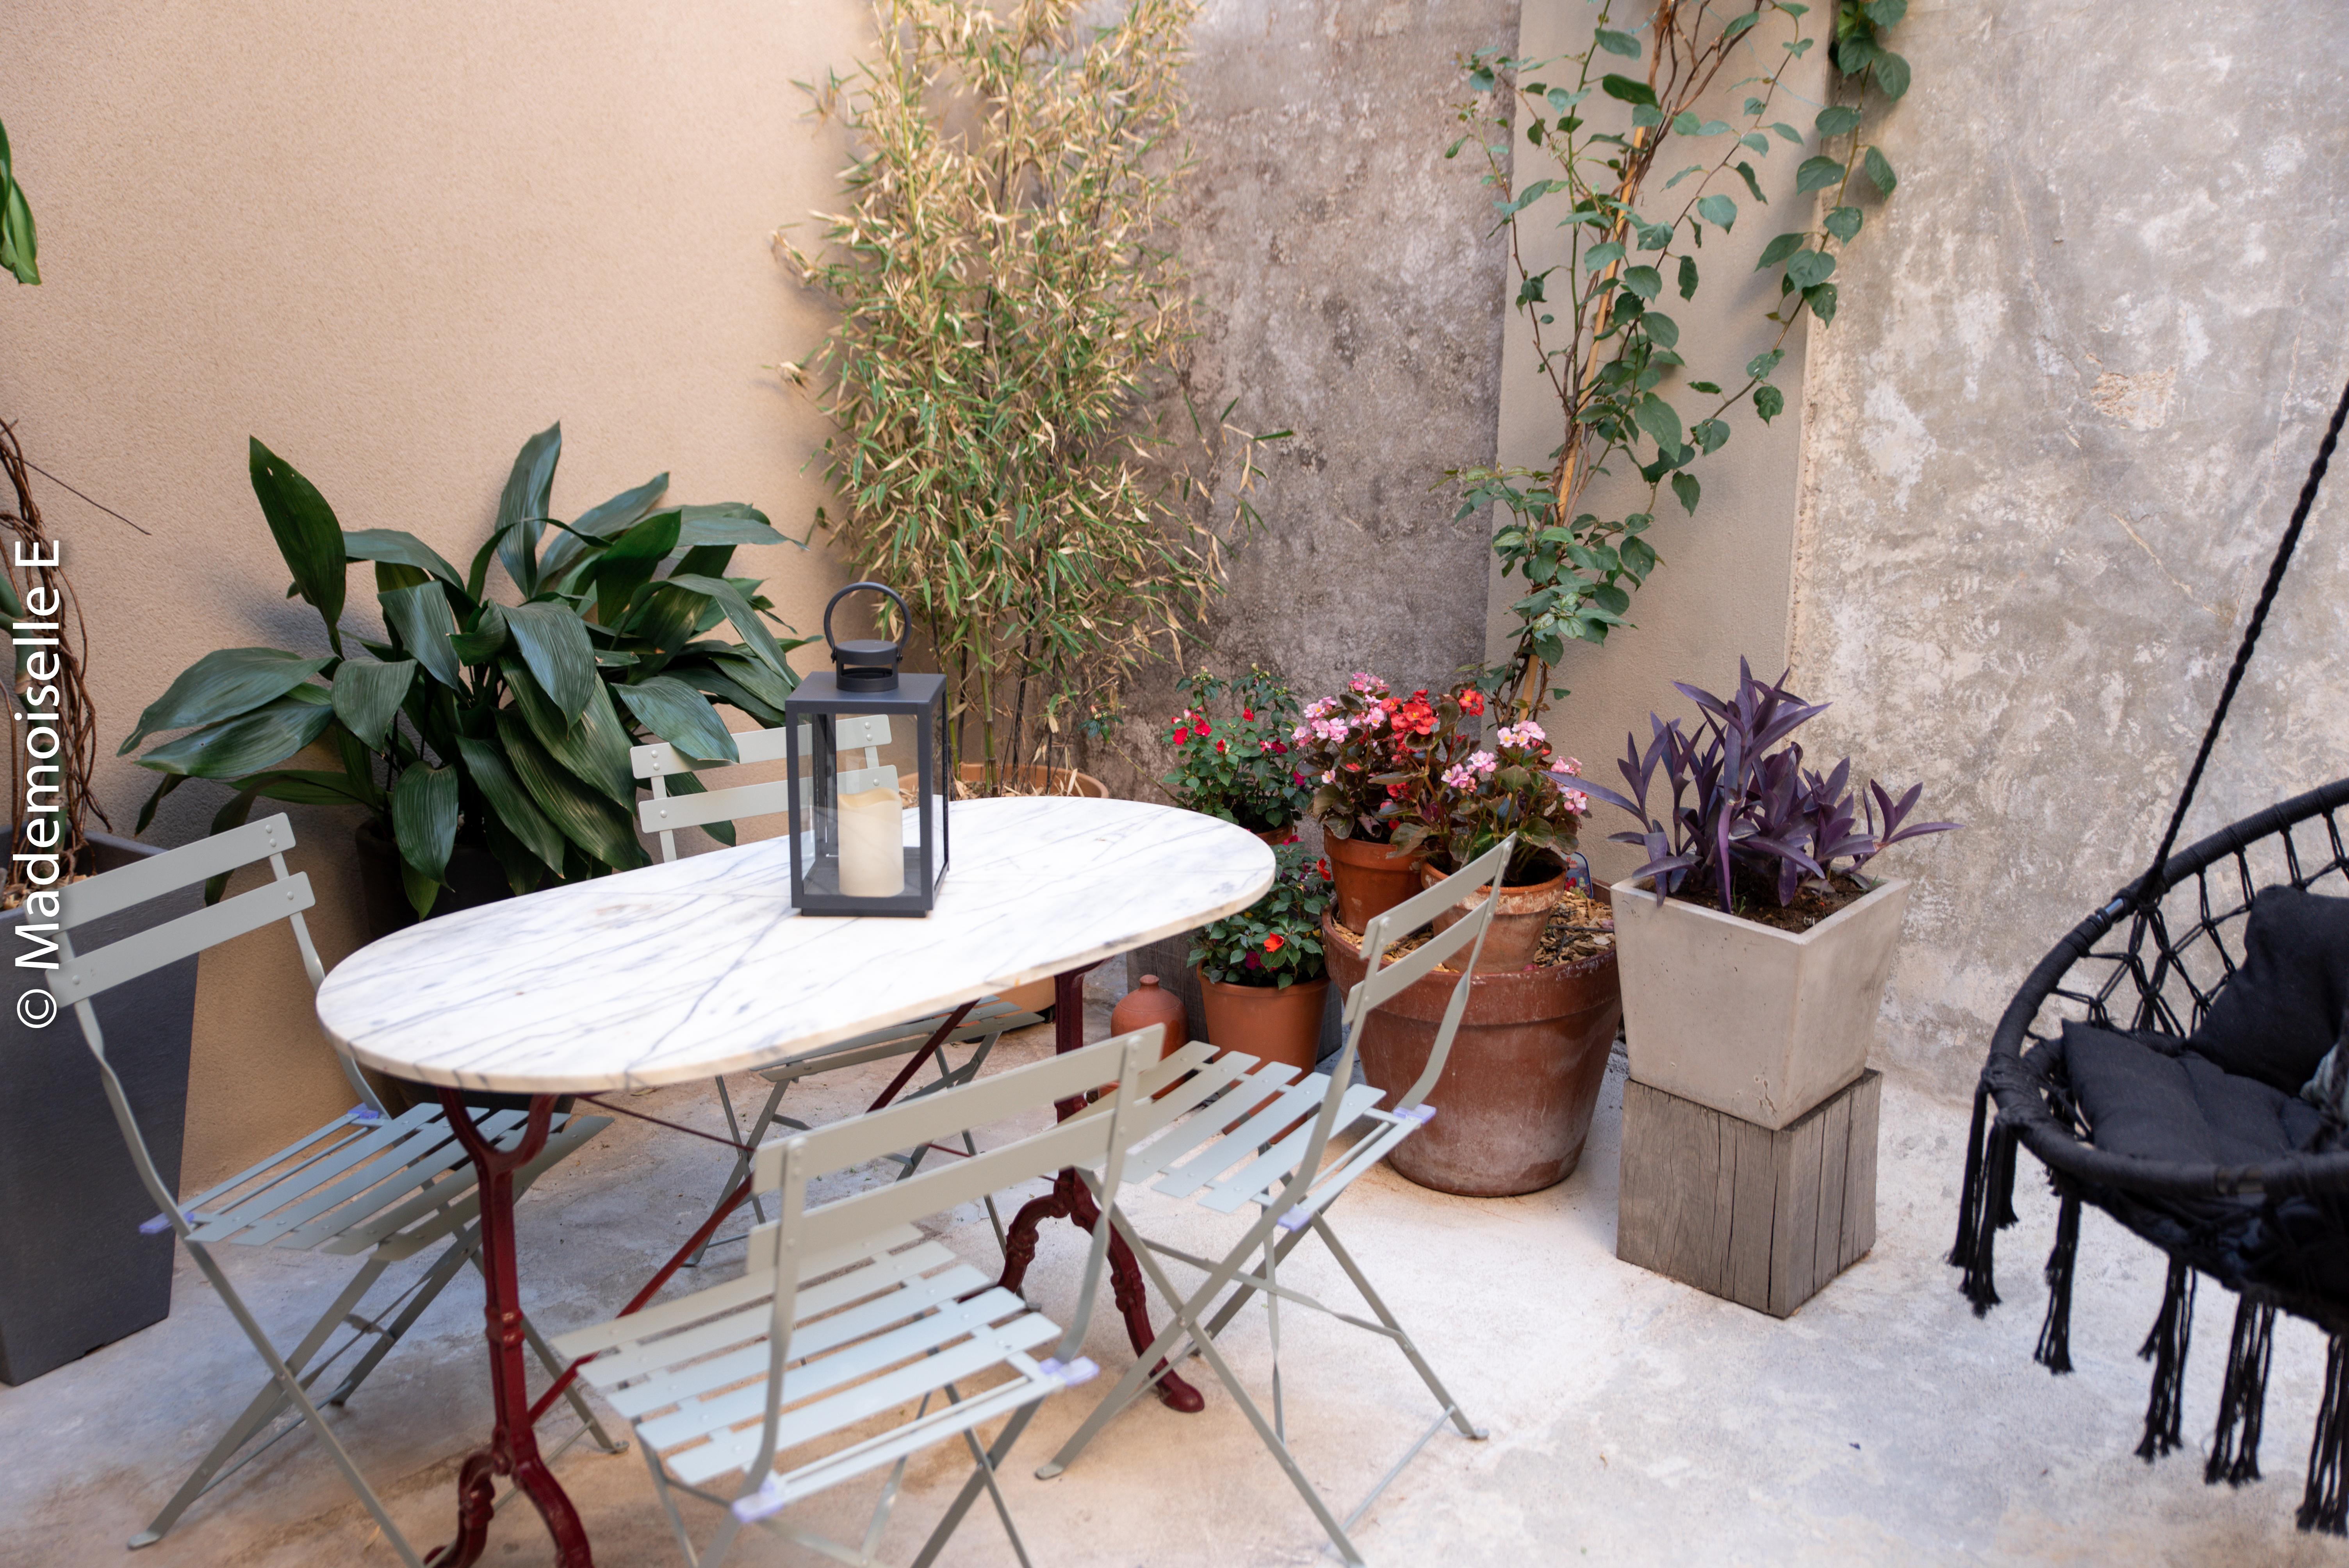 5-conseils-pour-amenager-sa-terrasse-2-mademoiselle-e